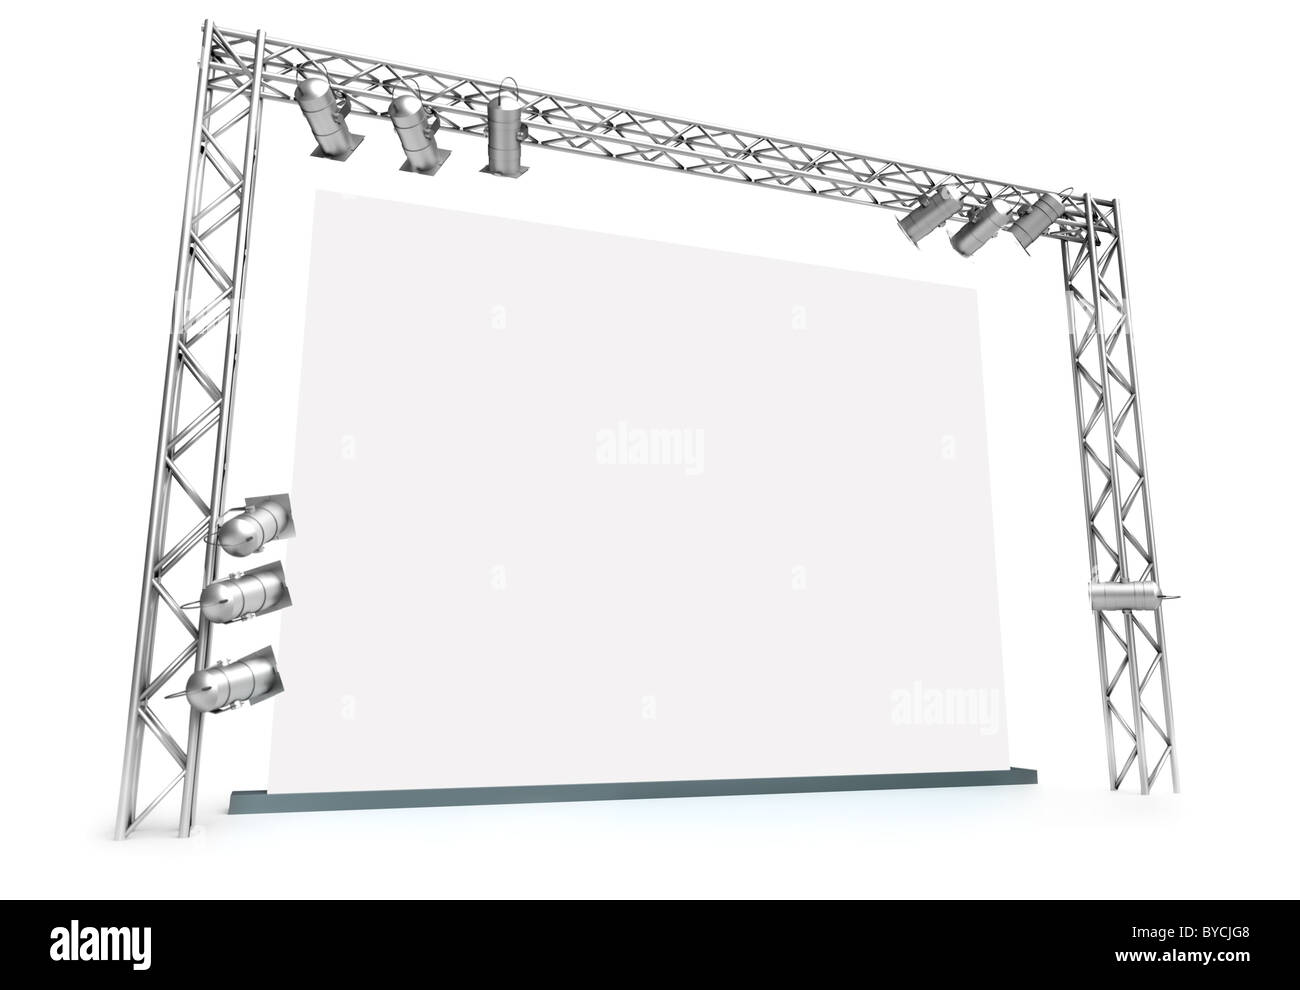 Large screen - Stock Image